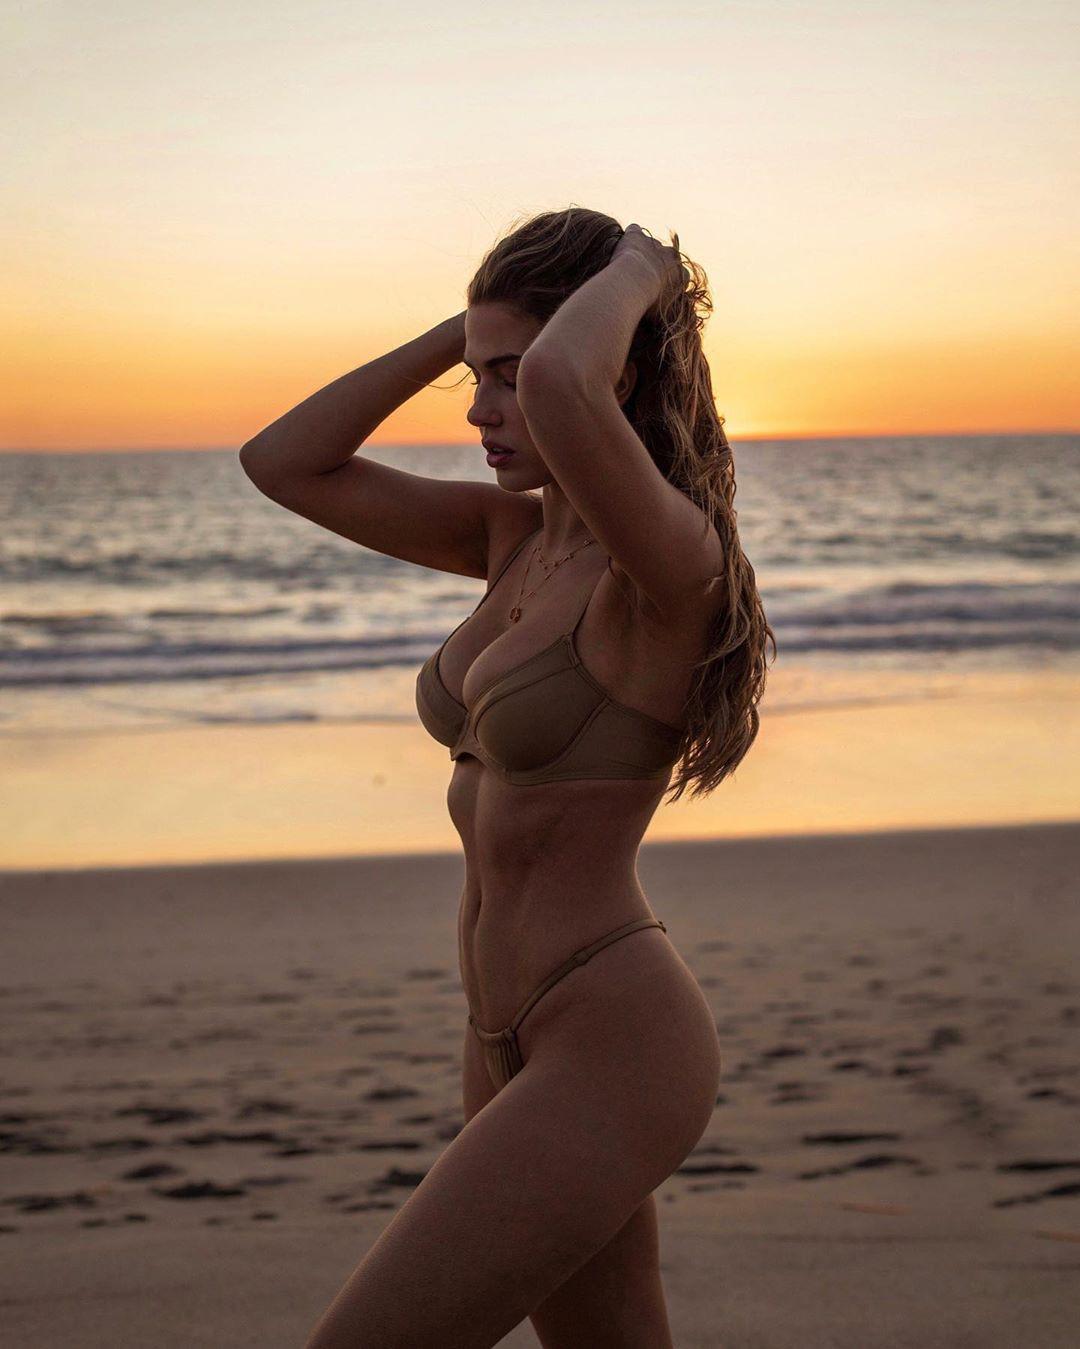 Kara Del Toro bikini outfits for women, fashion photography, legs picture